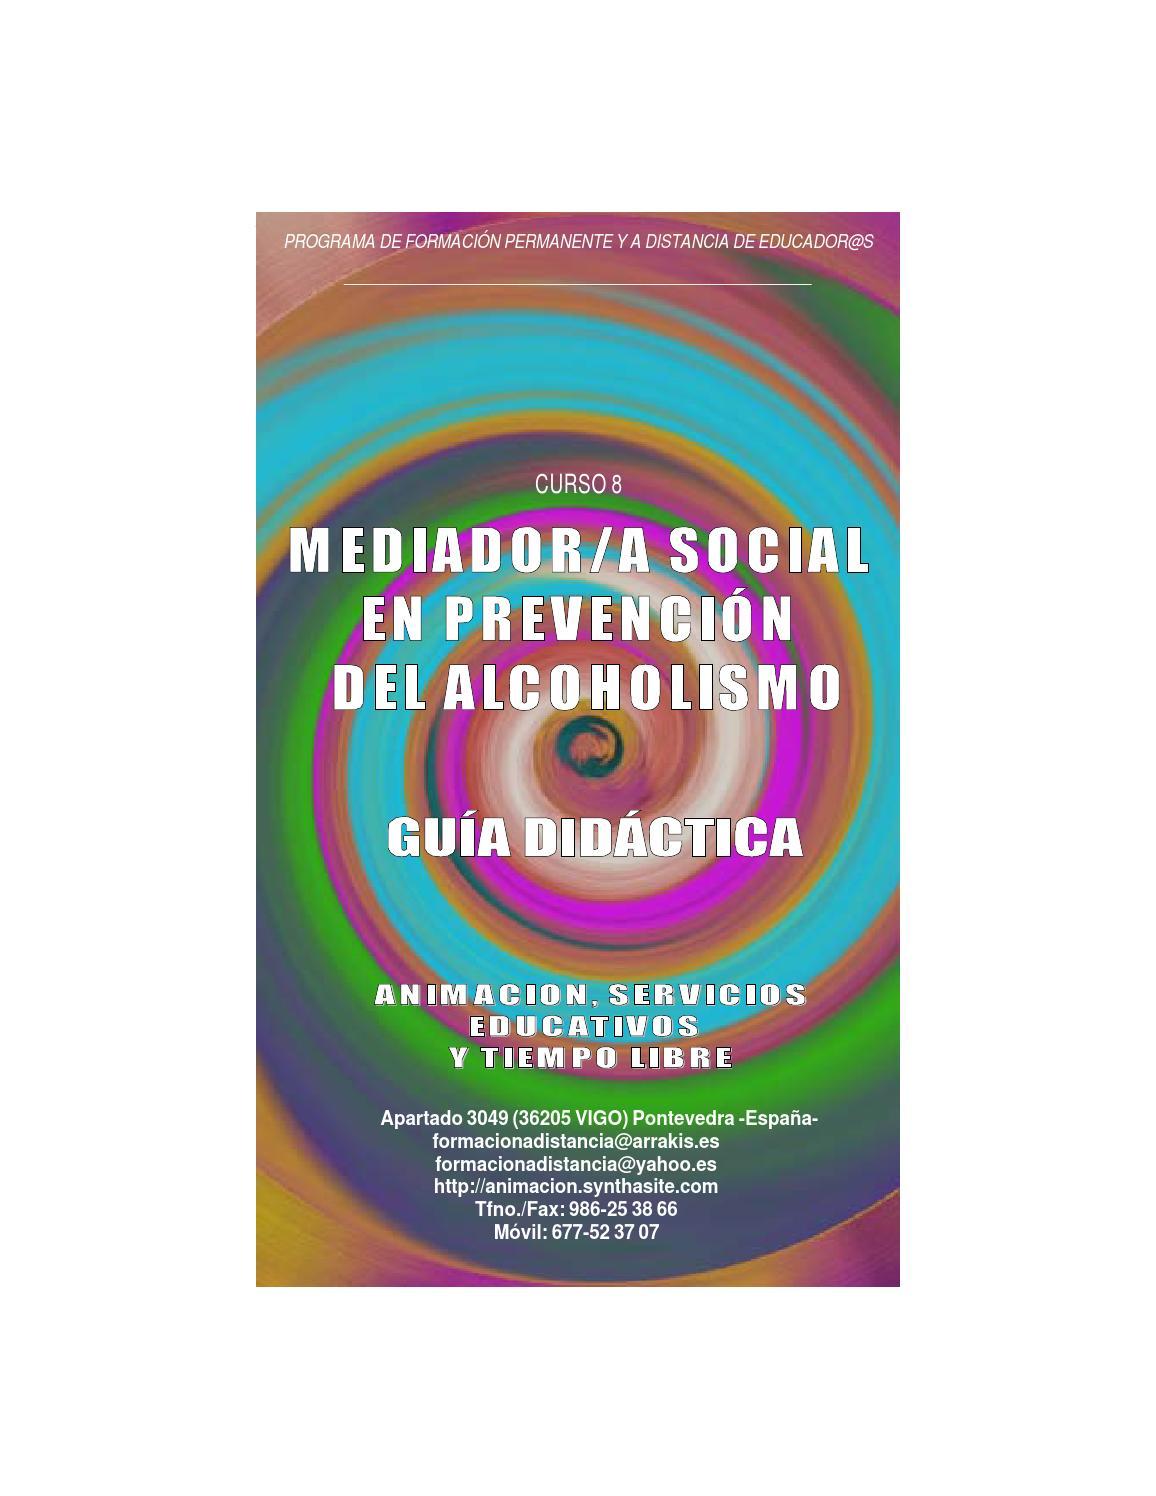 Thumbnail for Guia Didactica Curso Mediador prevencion del Alcoholismo